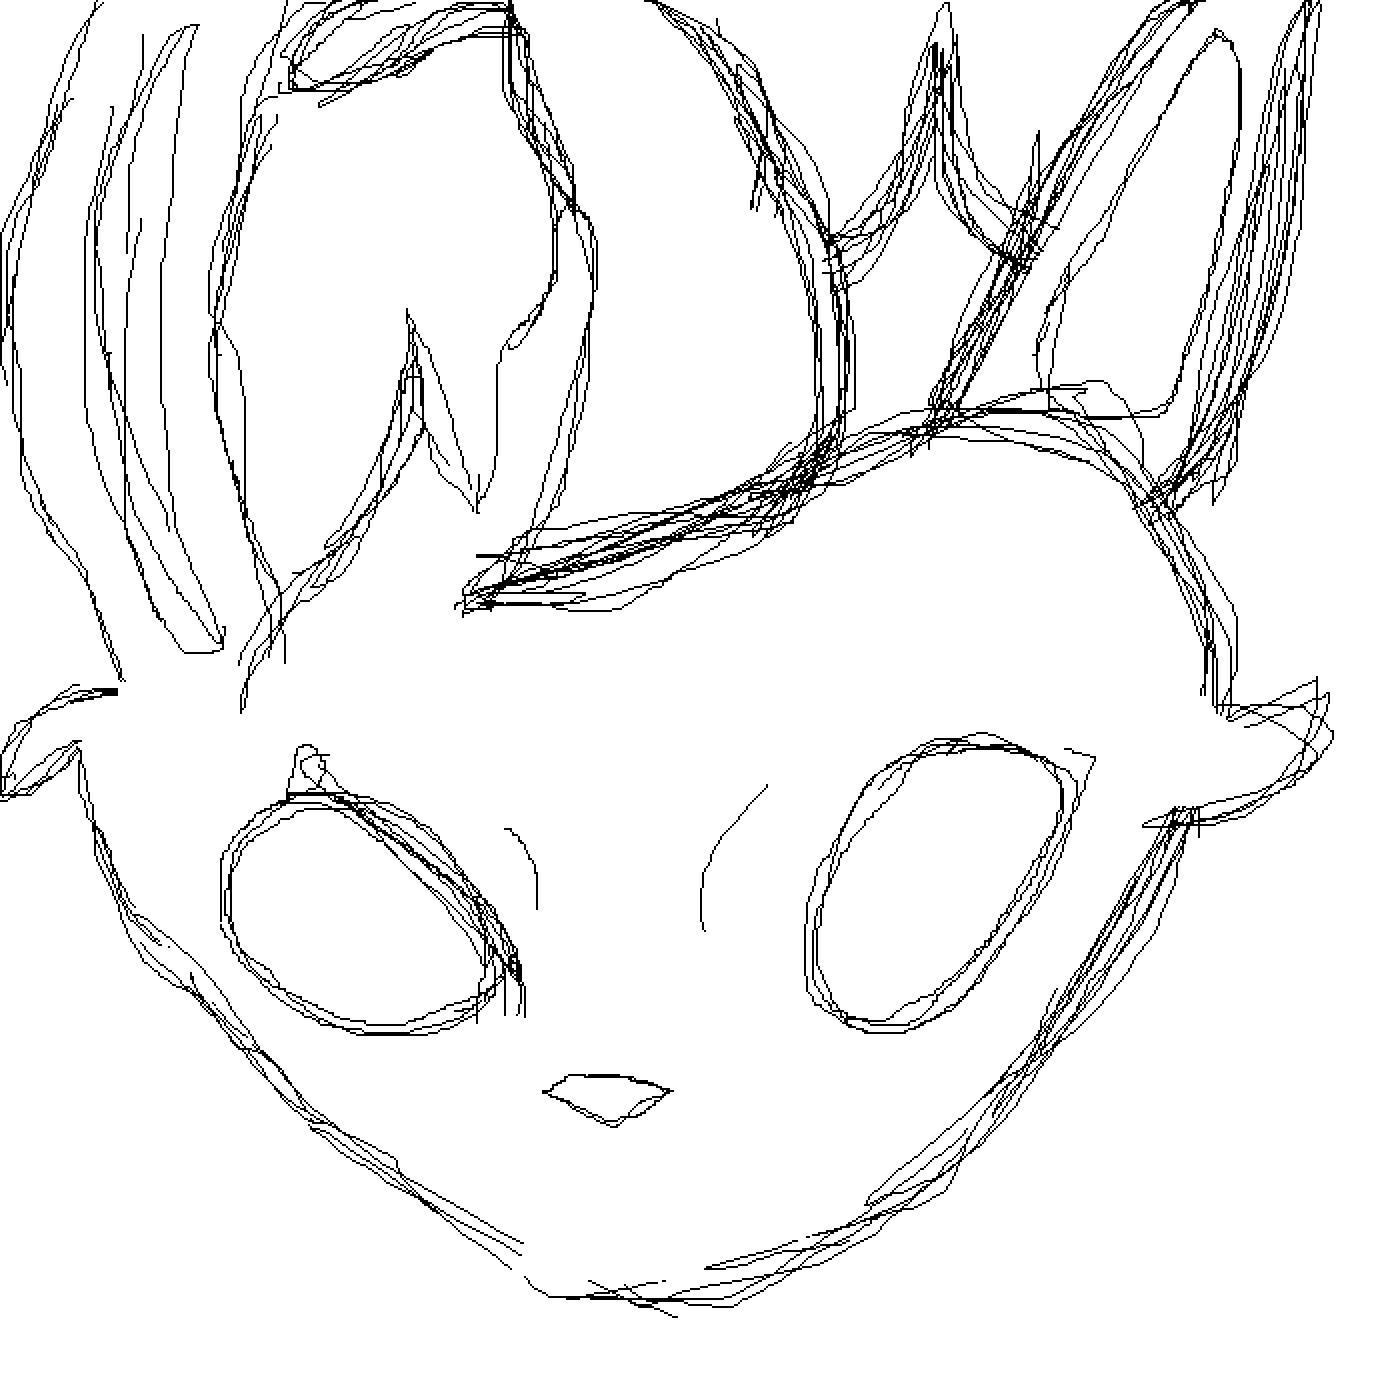 Leafeon sketch  by Zyragoon